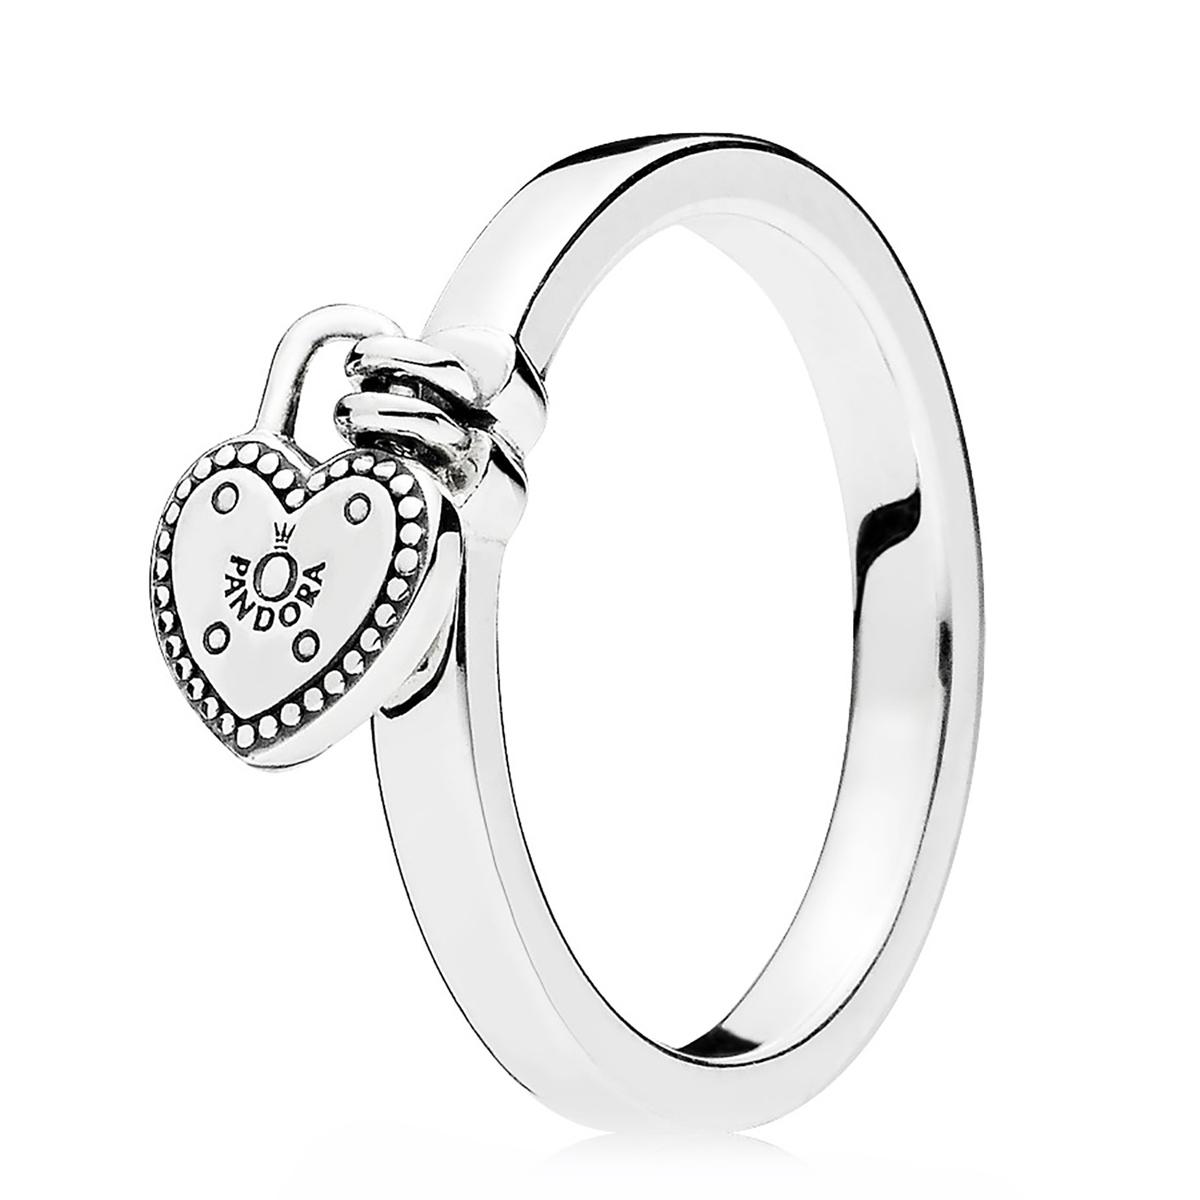 648837bc8 PANDORA Spiritual Symbols Ring - Pancharmbracelets.com